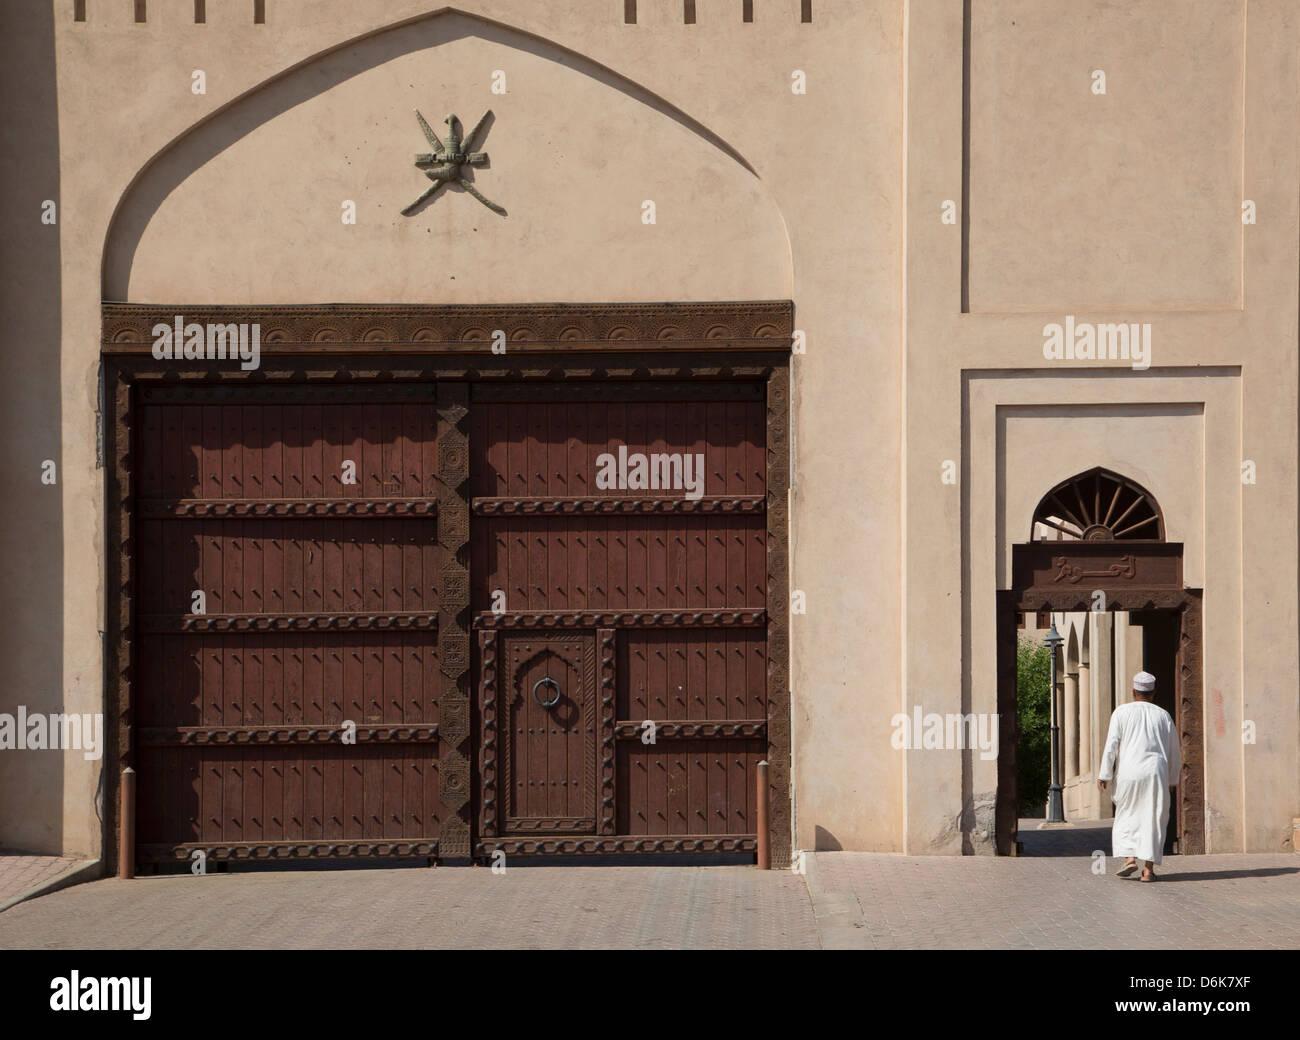 Le Souk, Nizwa, Oman, Middle East Photo Stock